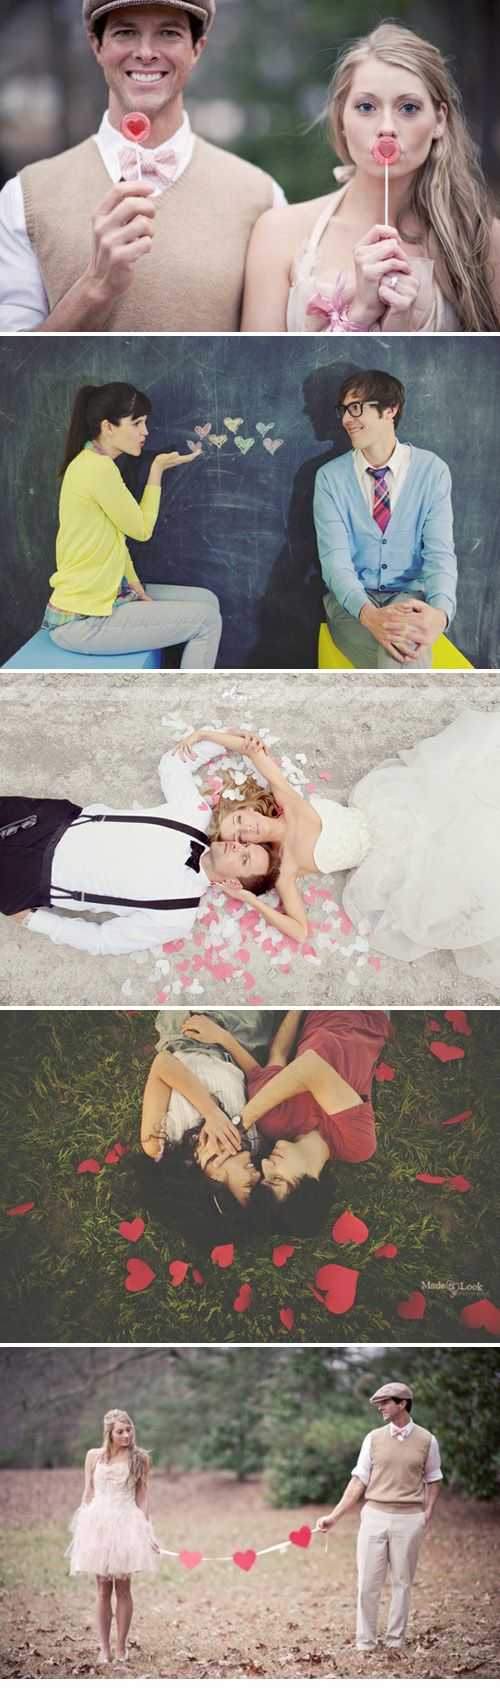 Adorable wedding/engagement photos